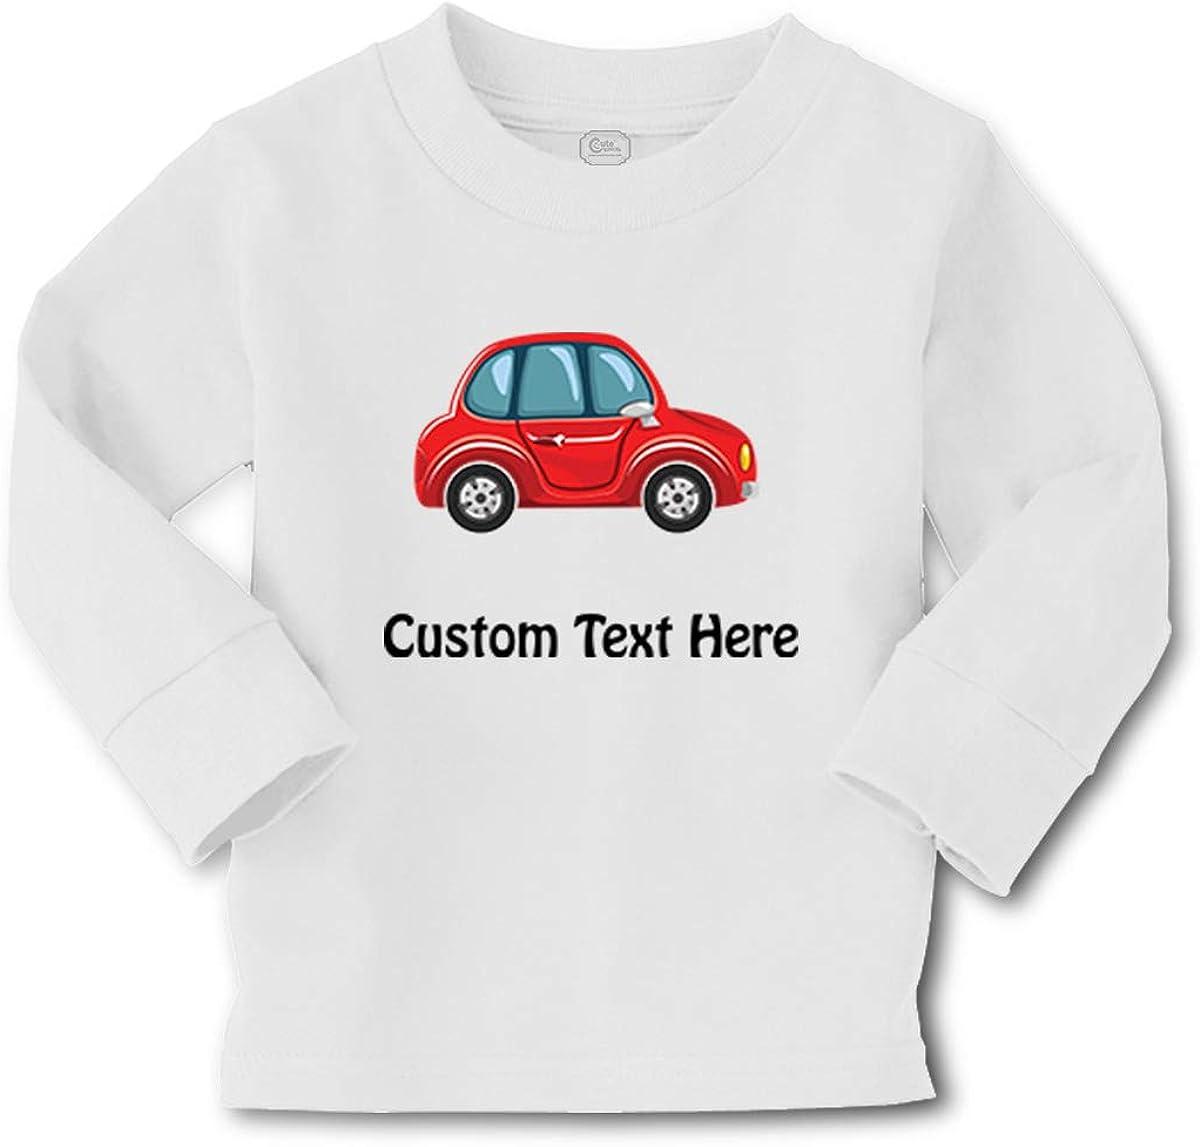 Cute Rascals Kids Long Sleeve T Shirt Red1 Little Car Auto Transportation Boy & Girl Clothes